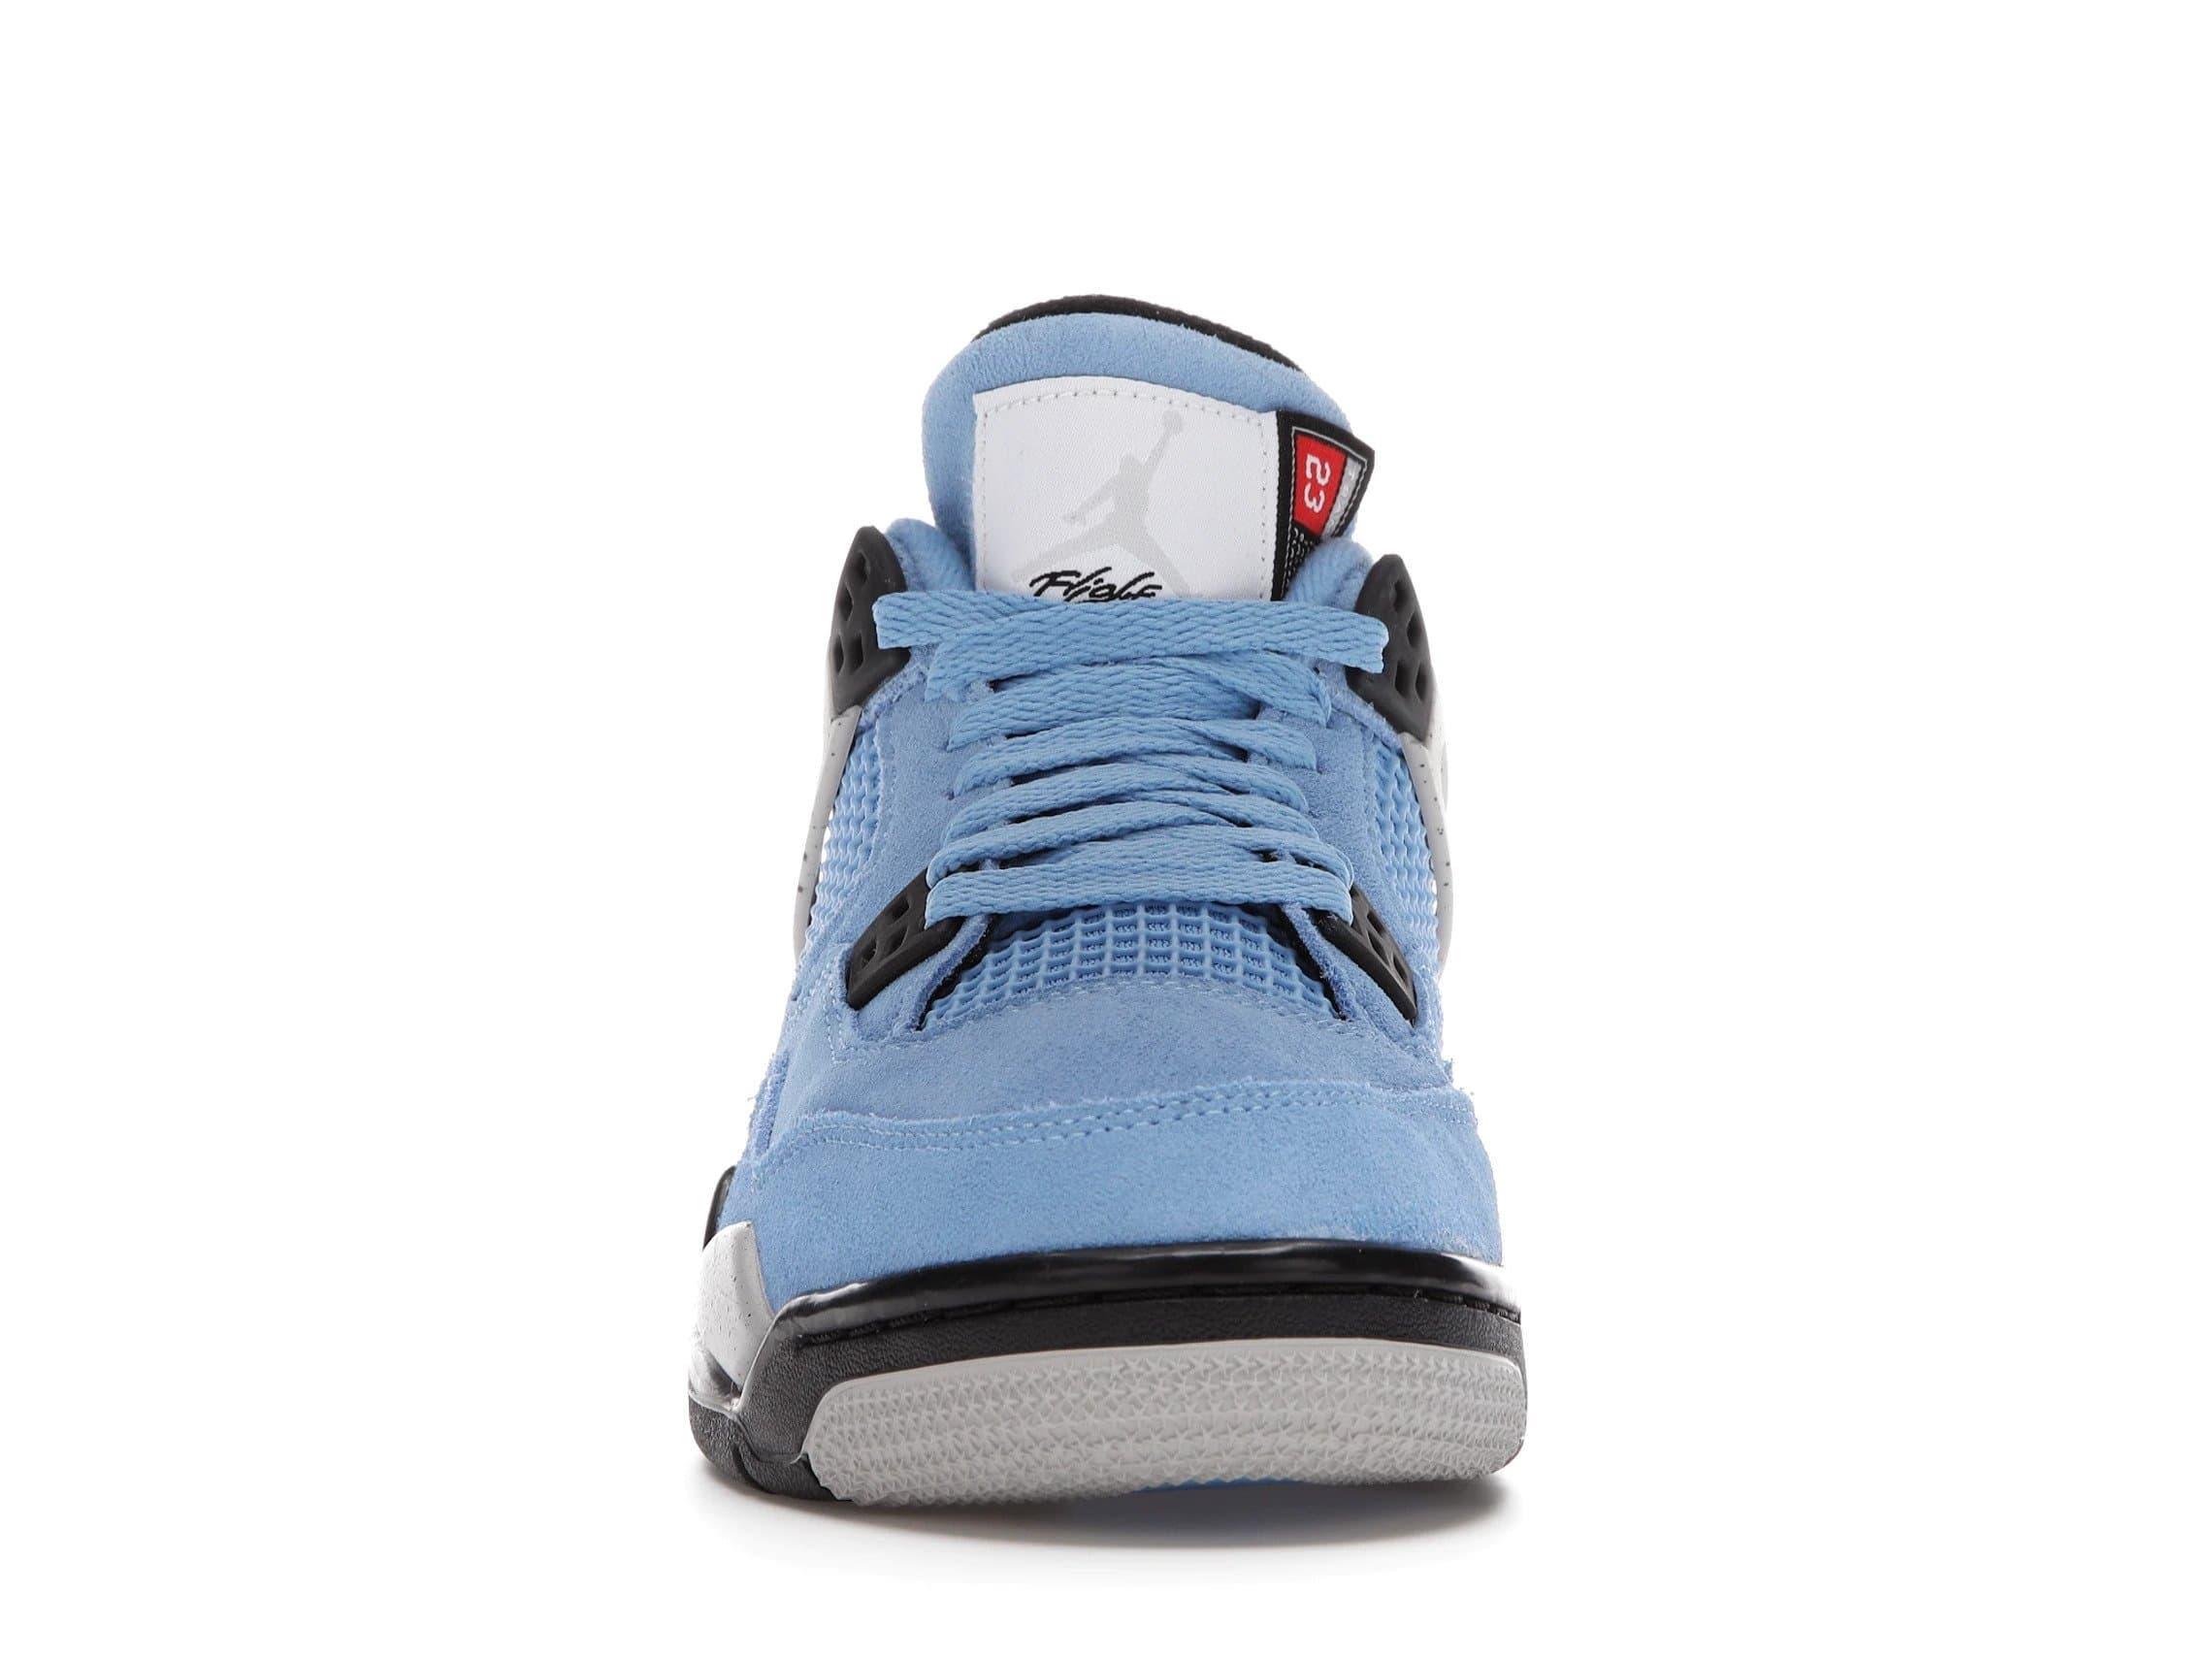 slide 2 - Jordan 4 Retro University Blue (GS)